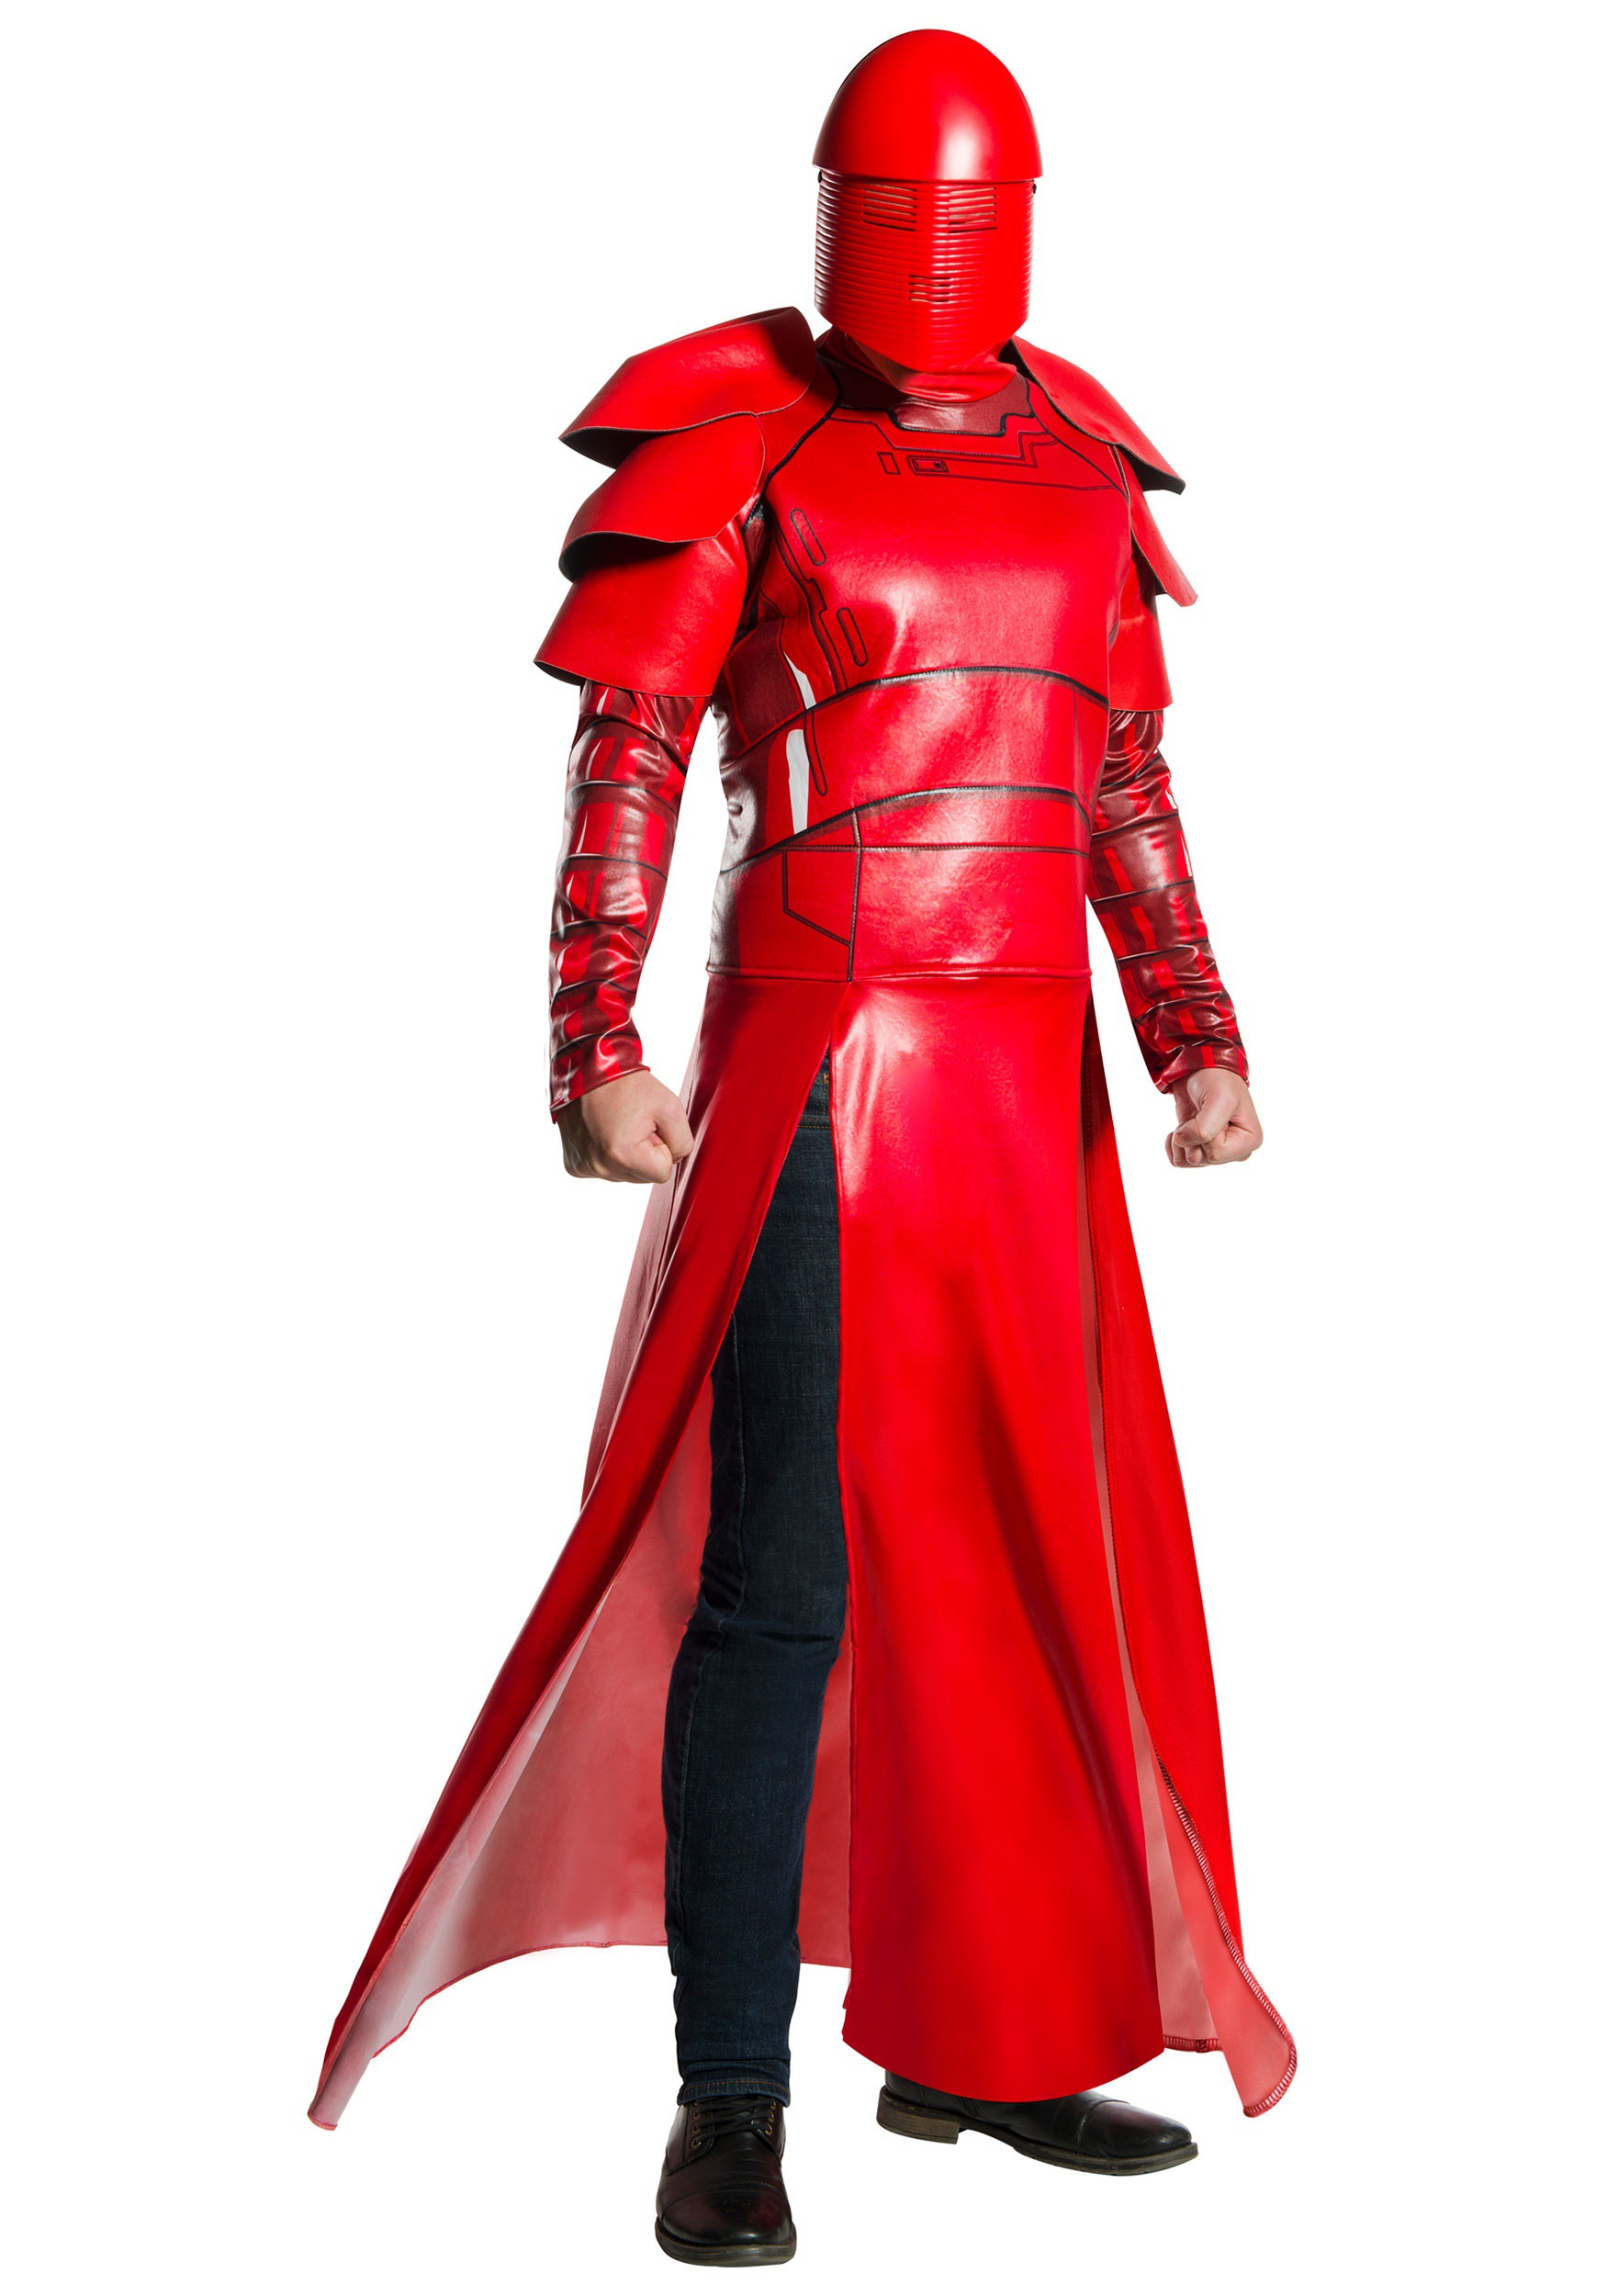 Stormtrooper Costumes Armor Halloweencostumescom